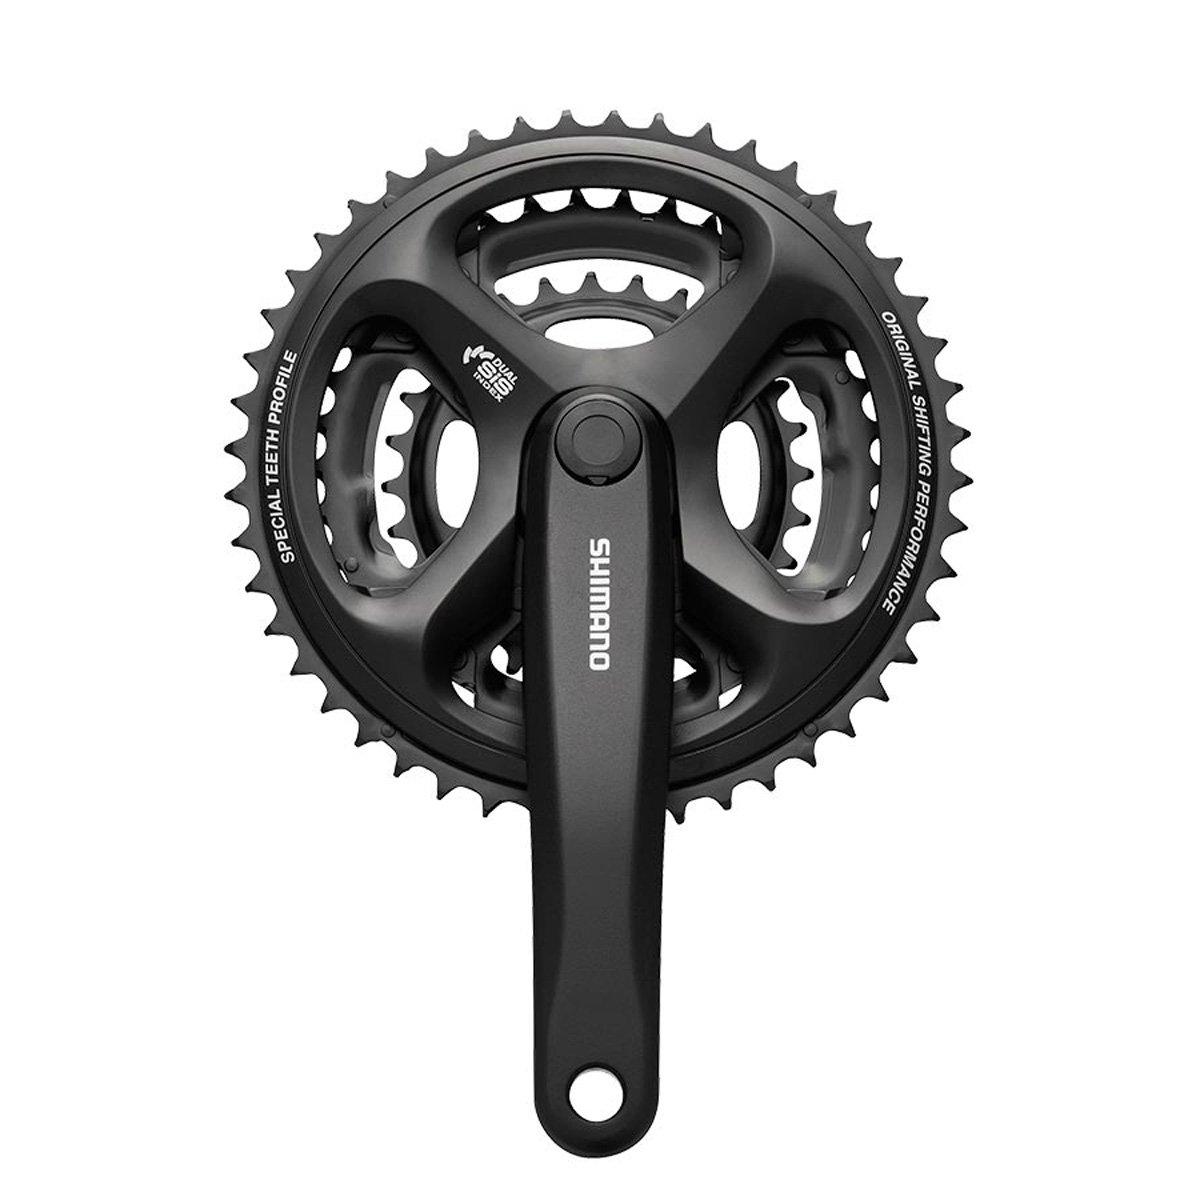 Best Rated In Bike Cranksets Helpful Customer Reviews Crank Shimano Alivio Touring 26 36 48 T Fc M171 Altus Crankset Black 170 Mm 38